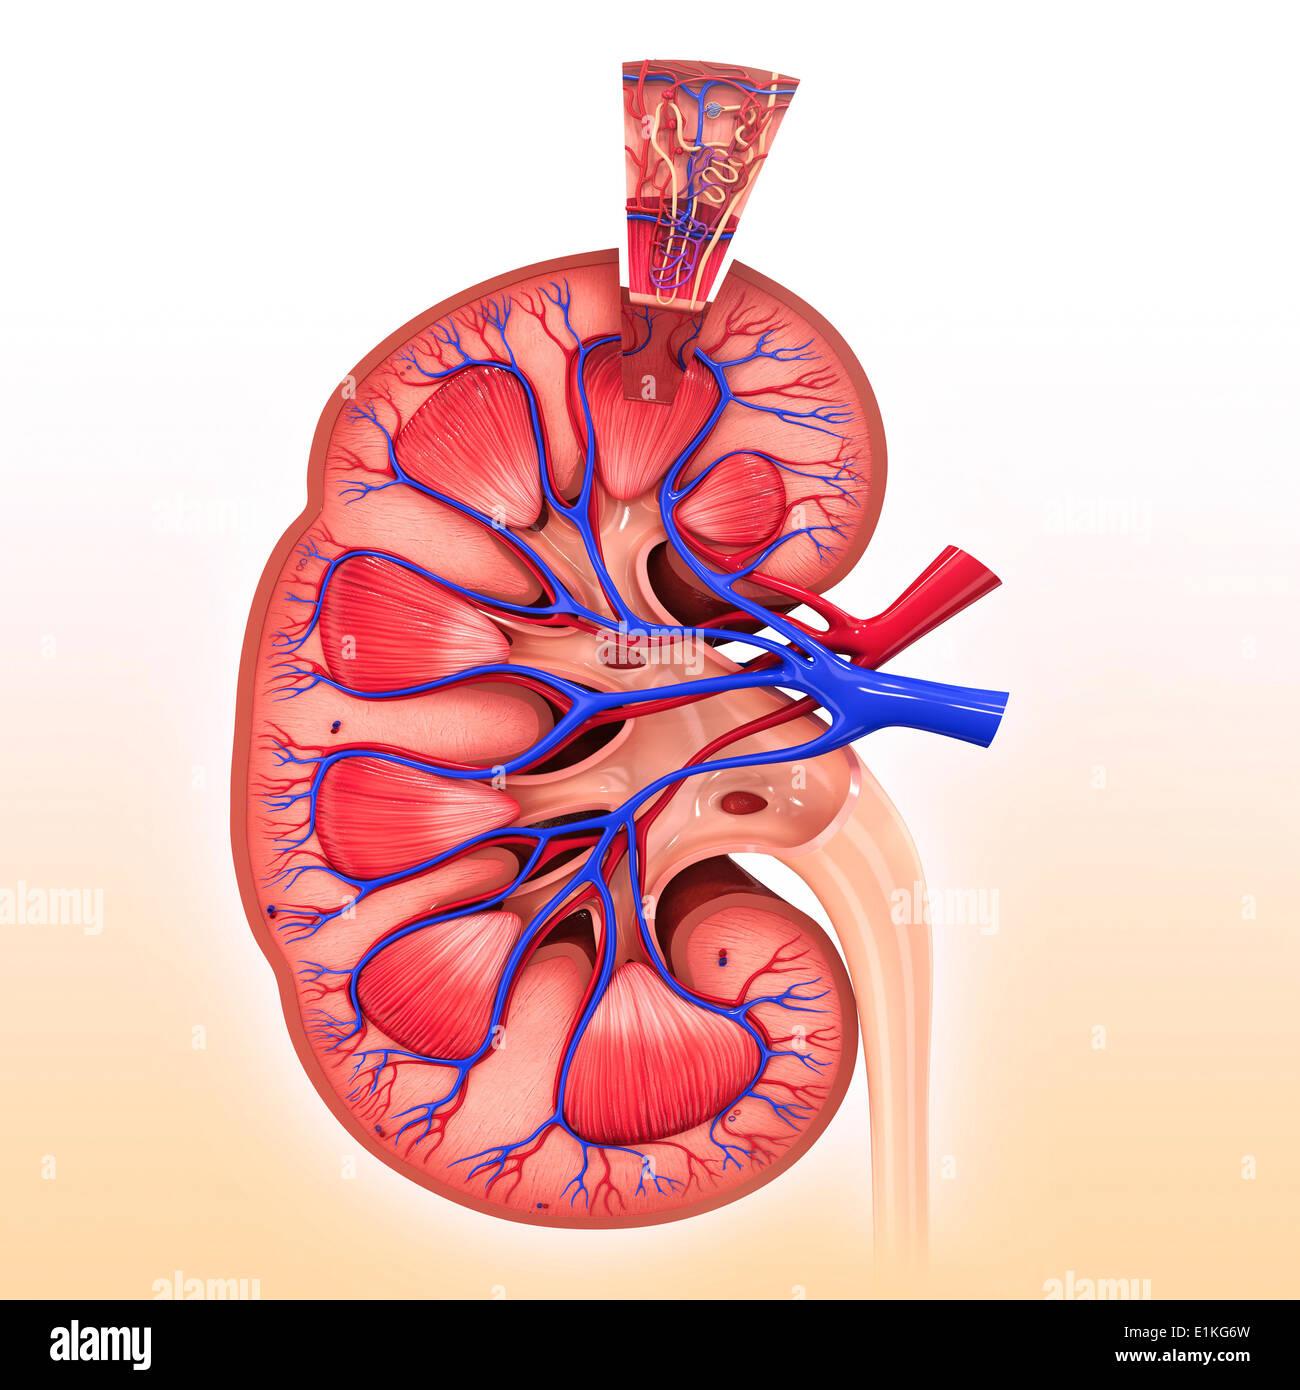 Kidney Nephron Stock Photos & Kidney Nephron Stock Images - Alamy